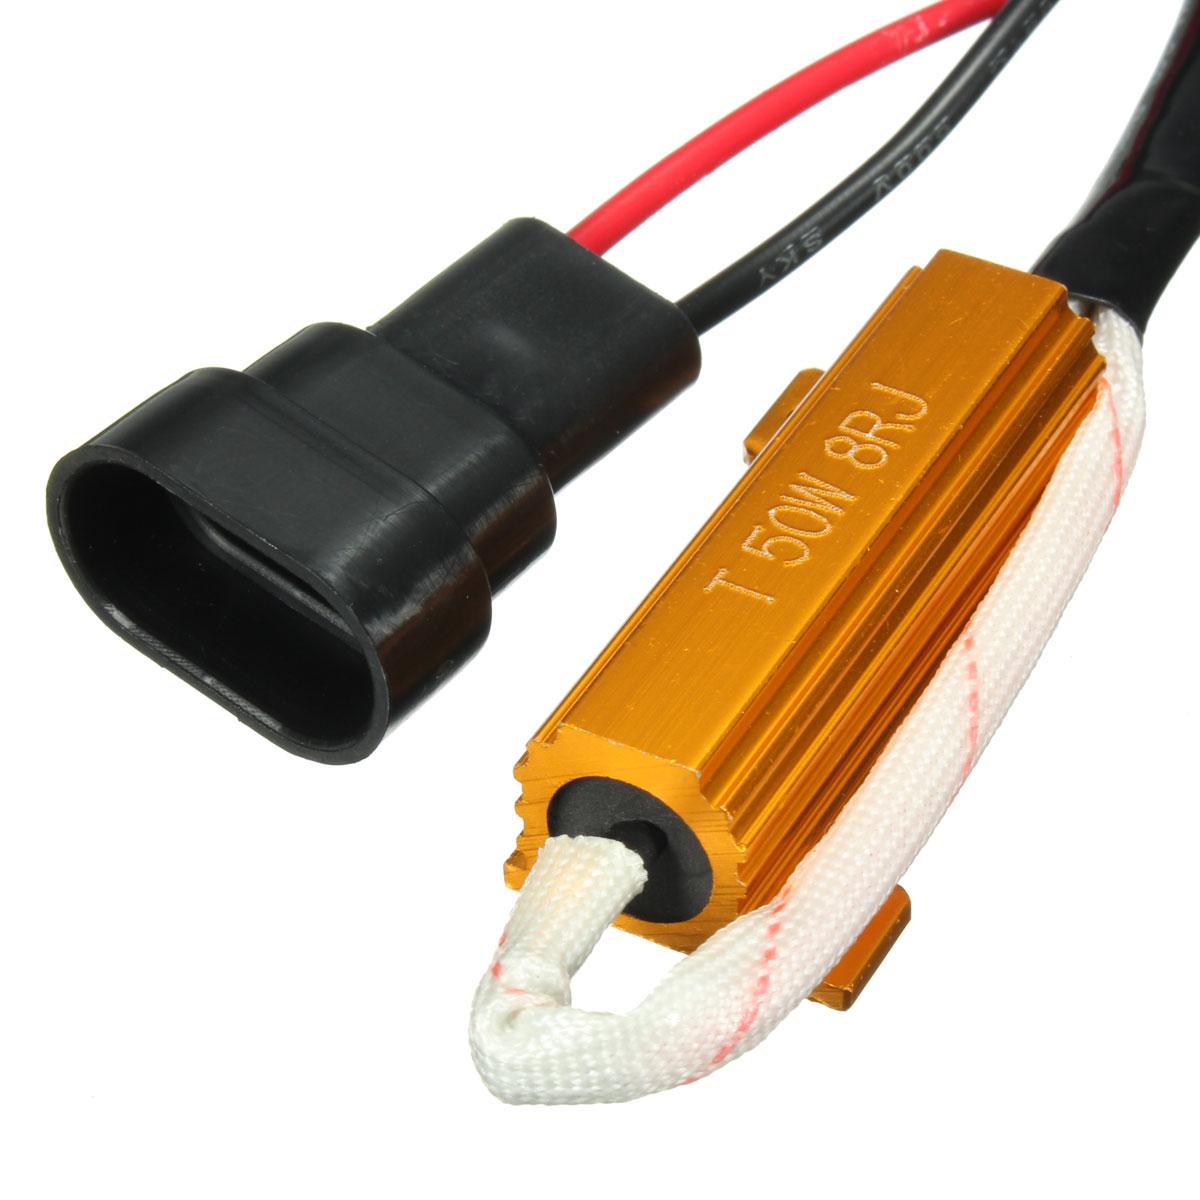 h4 headlight wiring diagram, h11 headlight wiring diagram, c5 headlight wiring diagram, g8 headlight wiring diagram, on h13 headlight wiring diagram